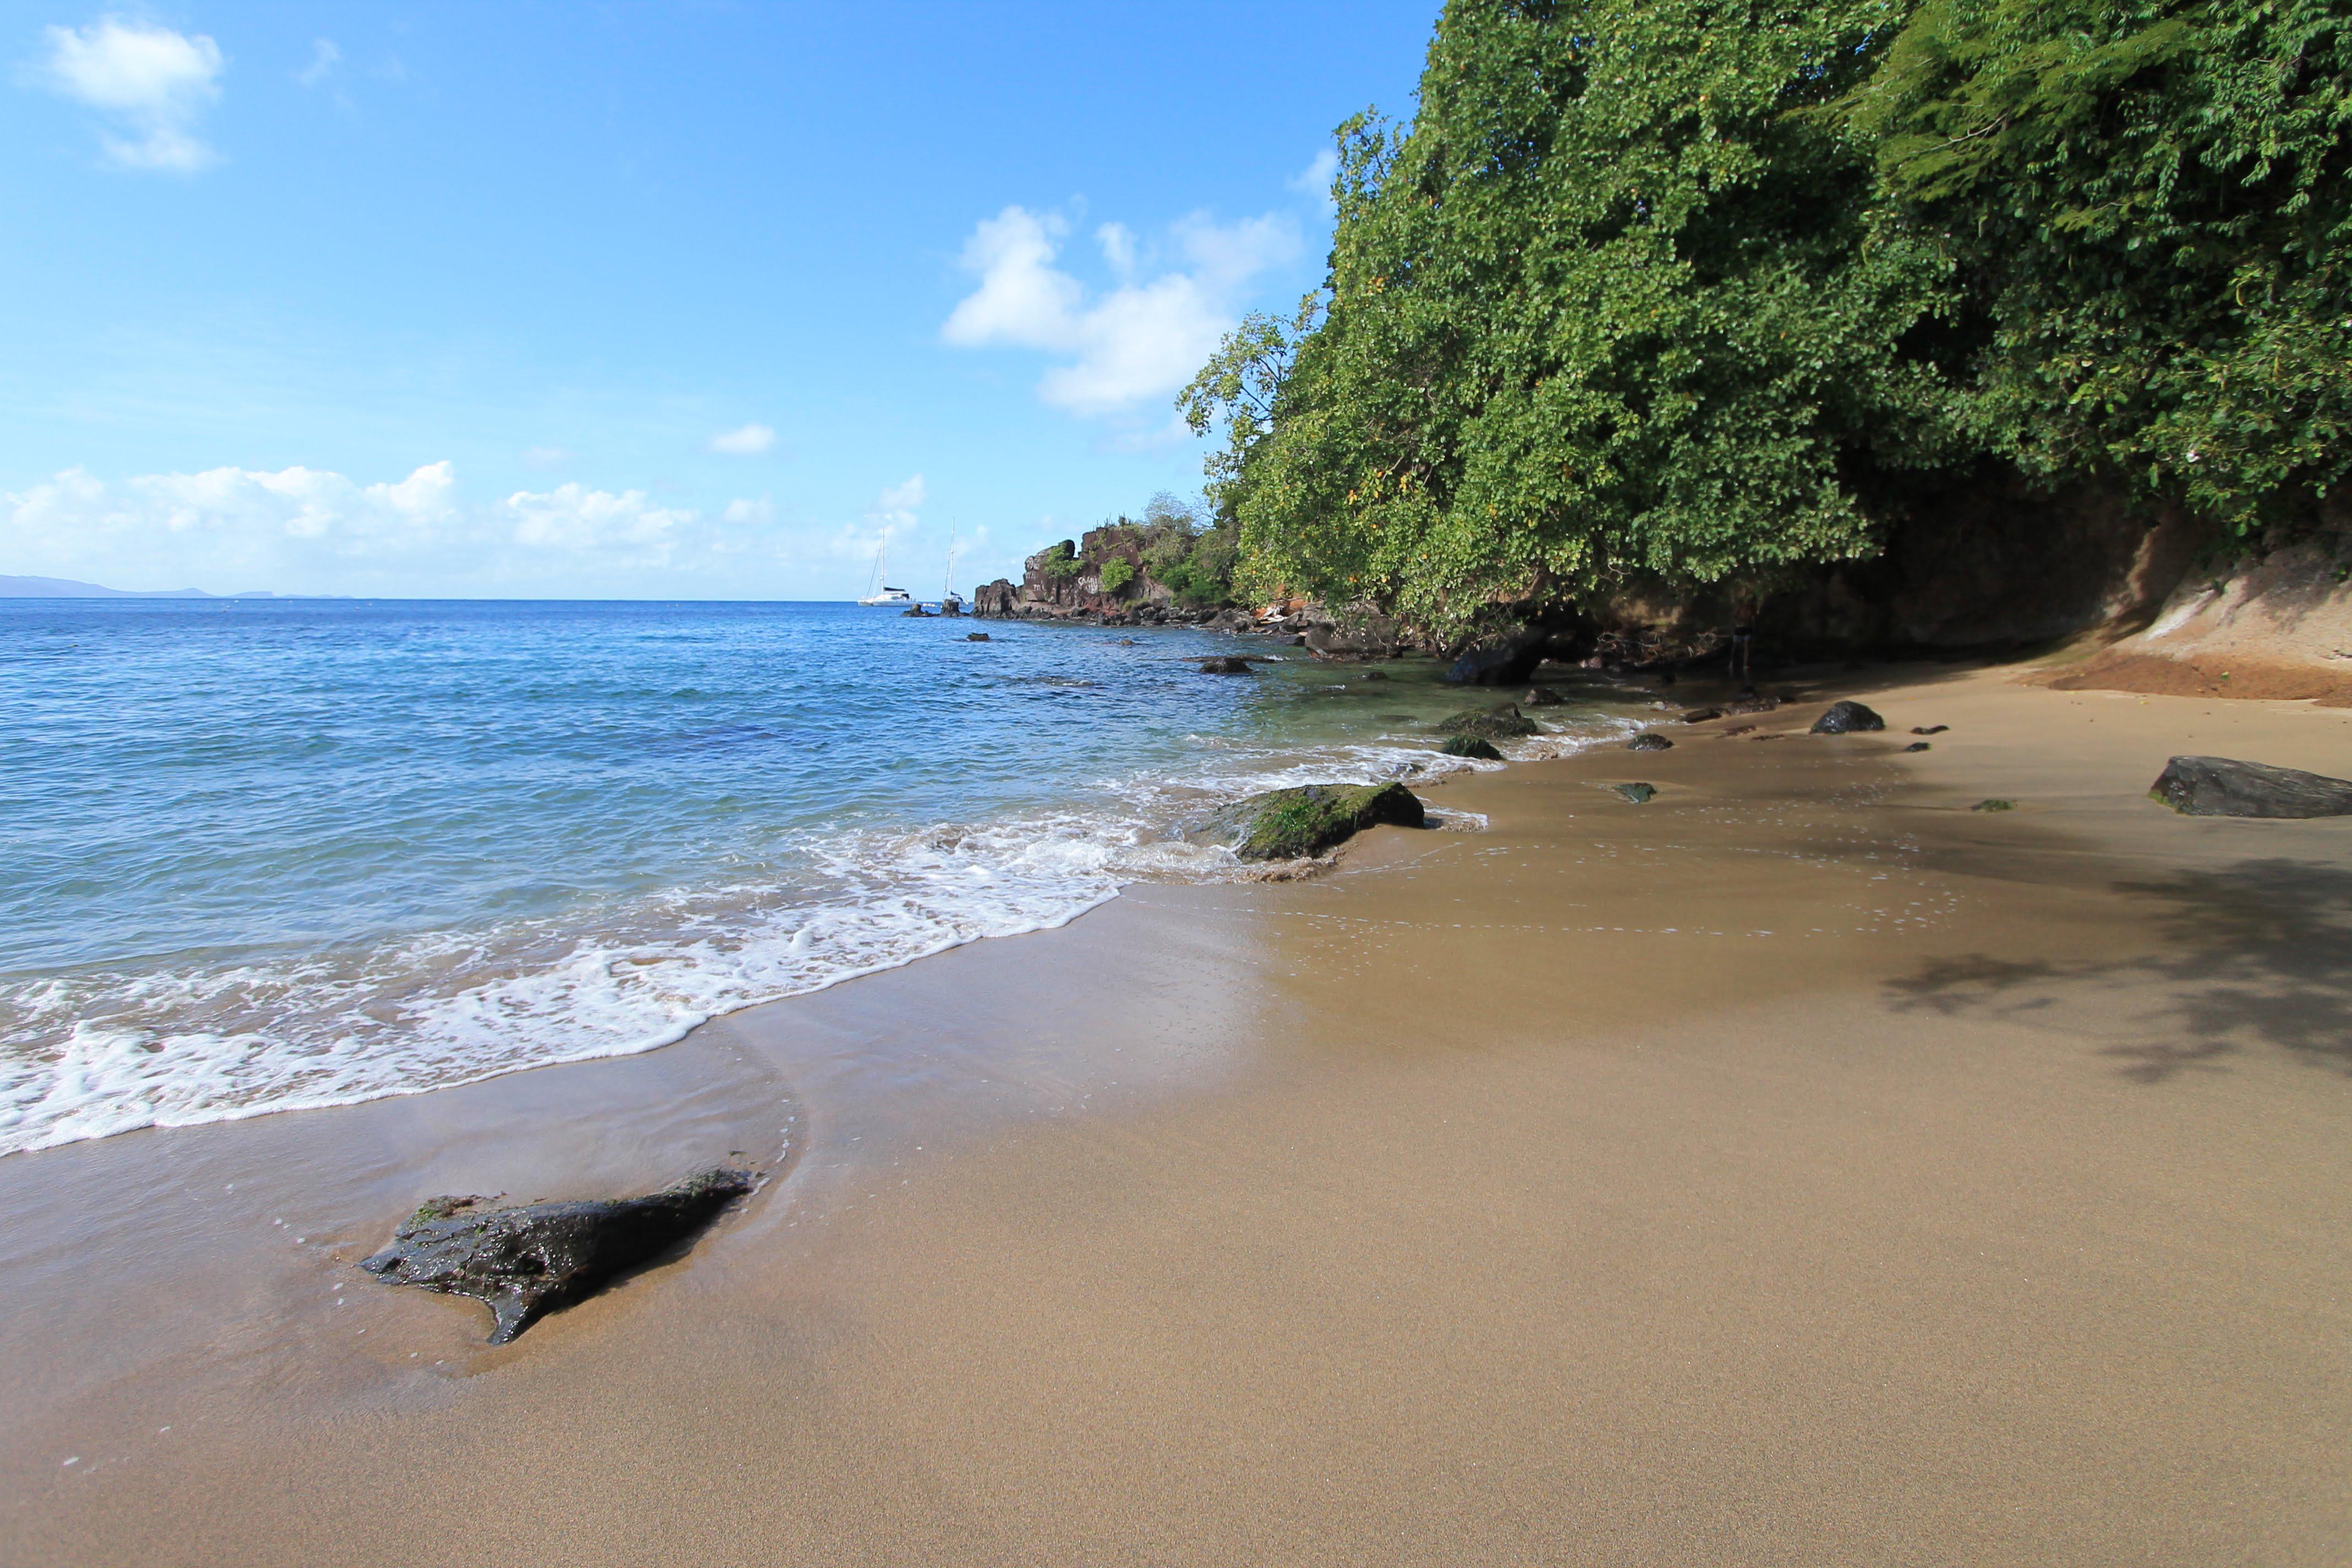 crociera ai caraibi st vincent & grenadine, Paradise Beach